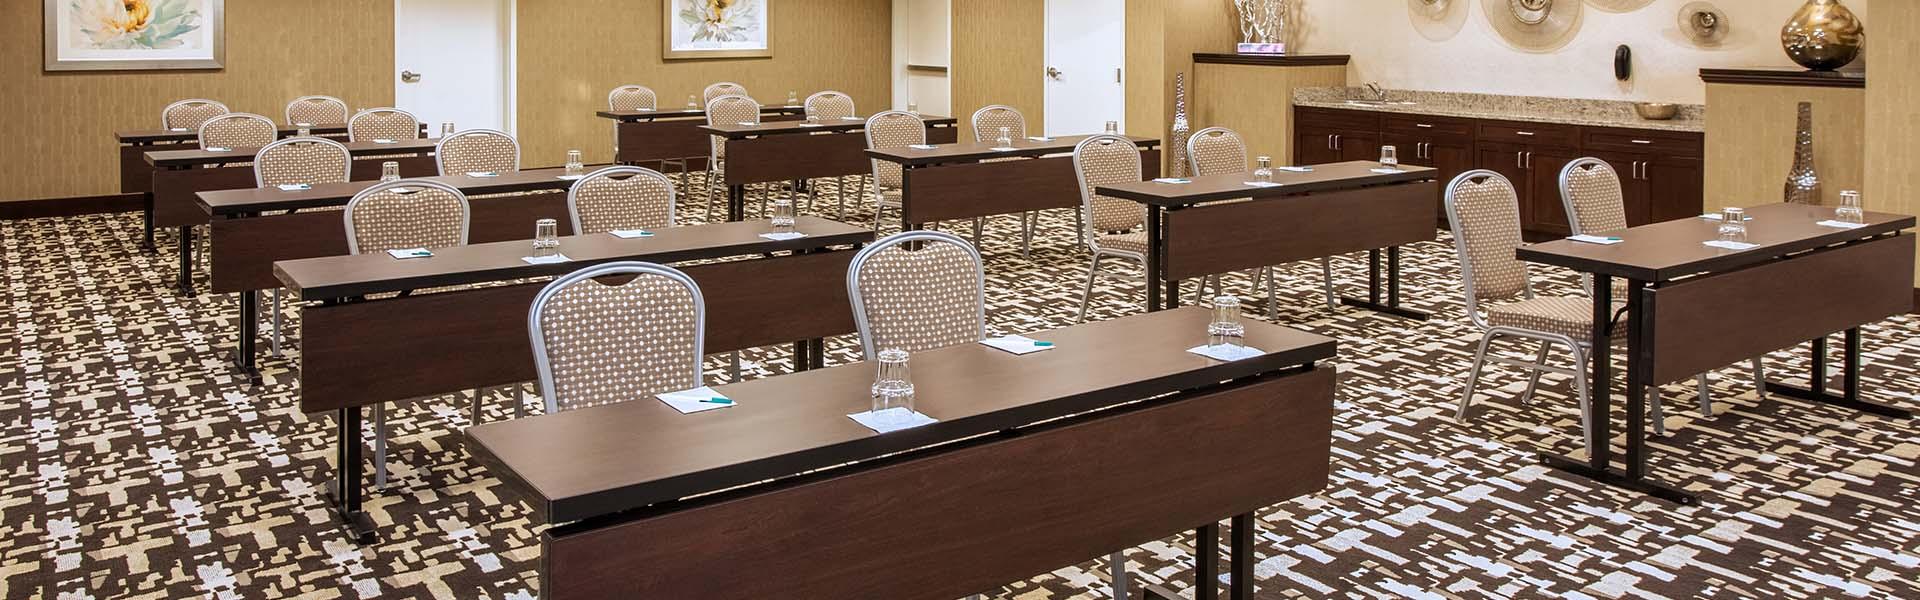 Portfolio | General Hotels Corporation Indianapolis Indiana